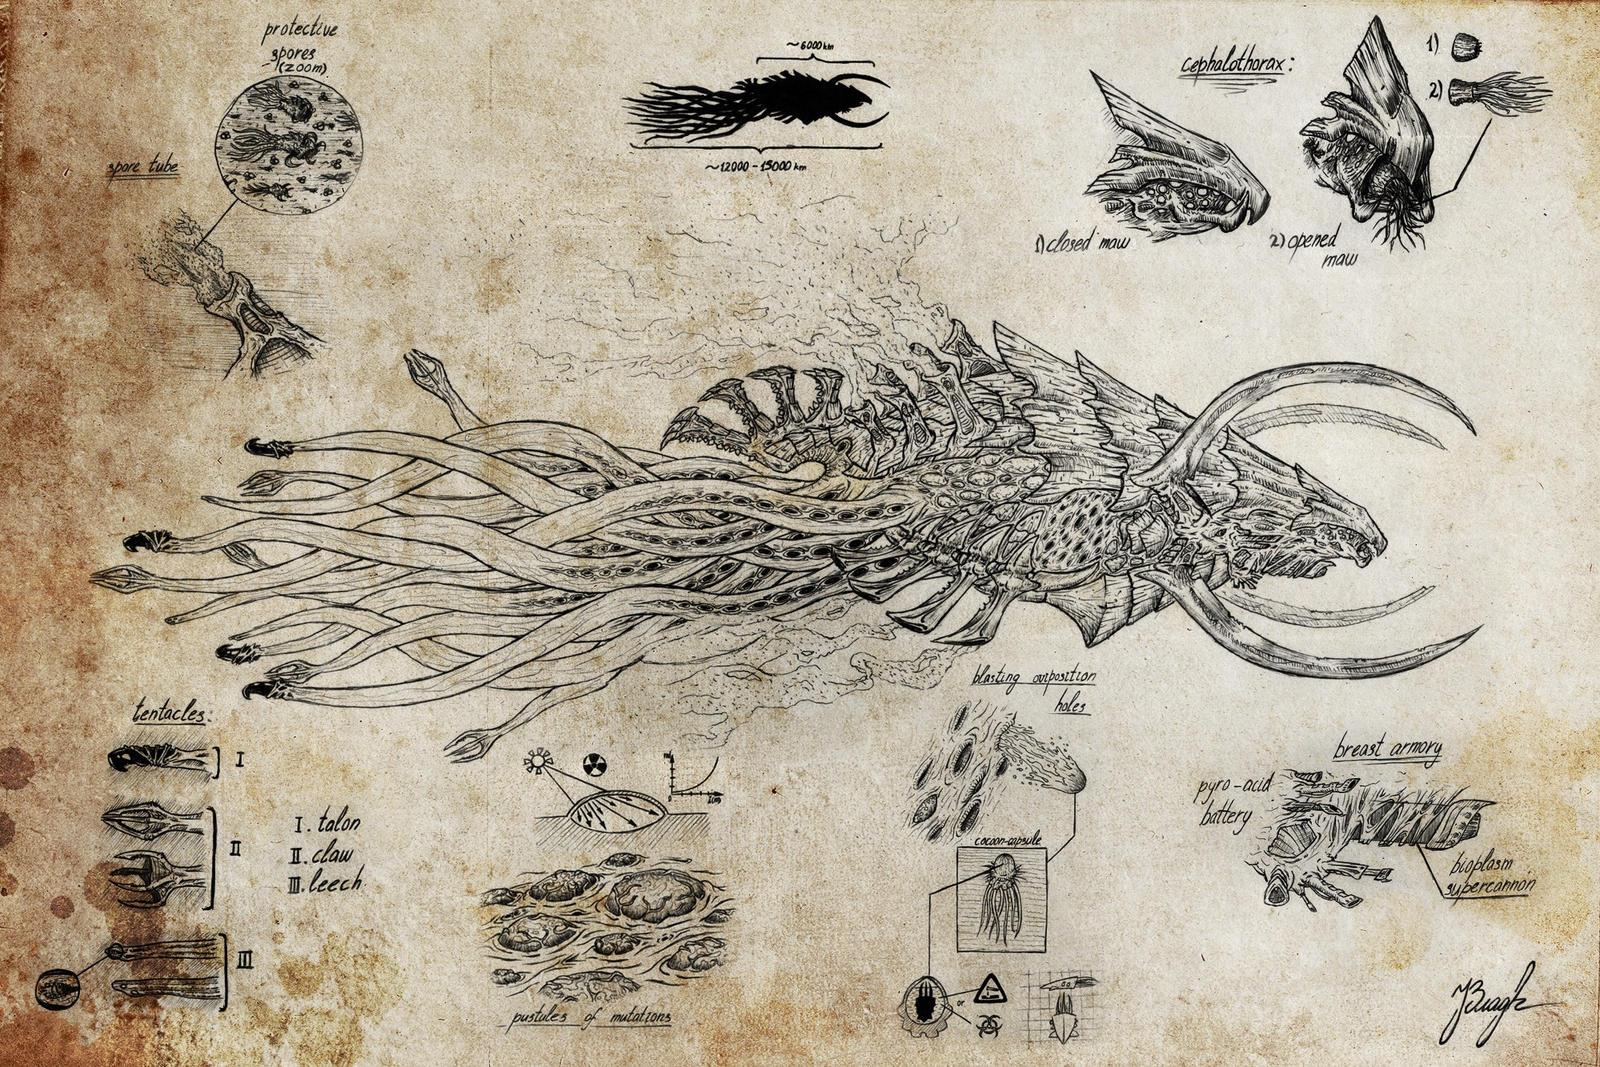 [GALERIE] Artworks - Page 6 Predator_hiveship_by_illwisdom-d75cg3j